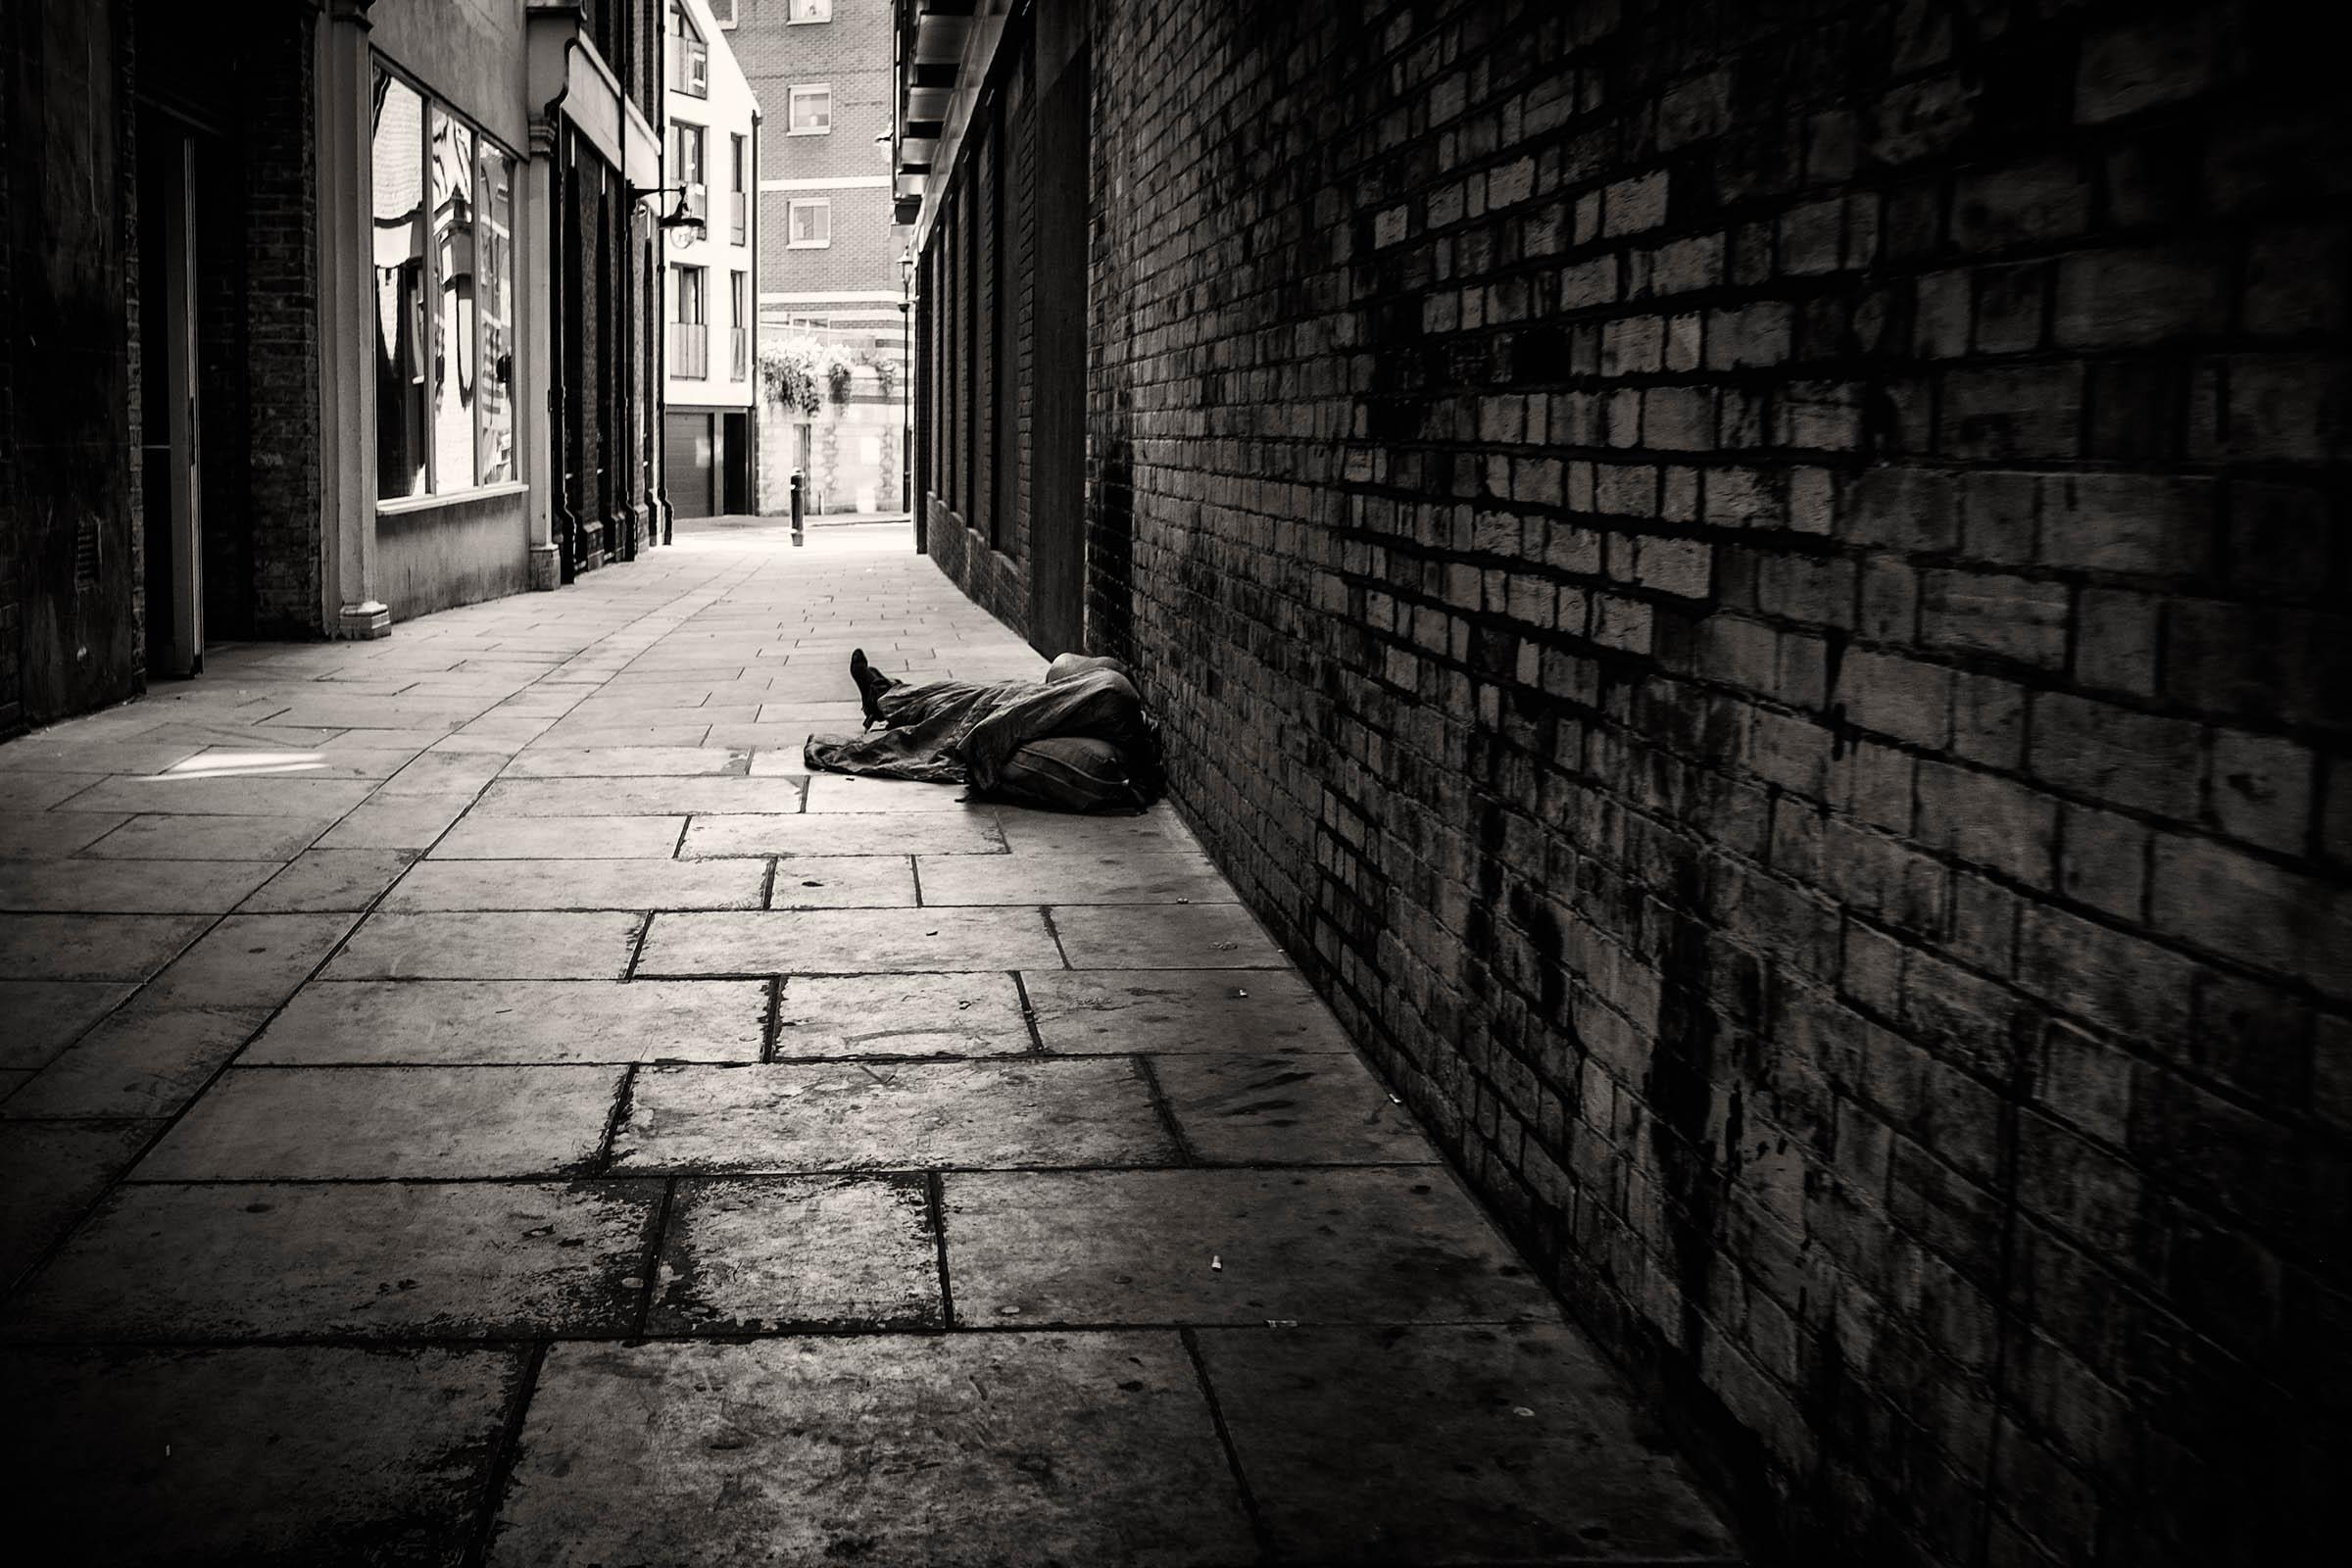 London alley sleeper (2014)